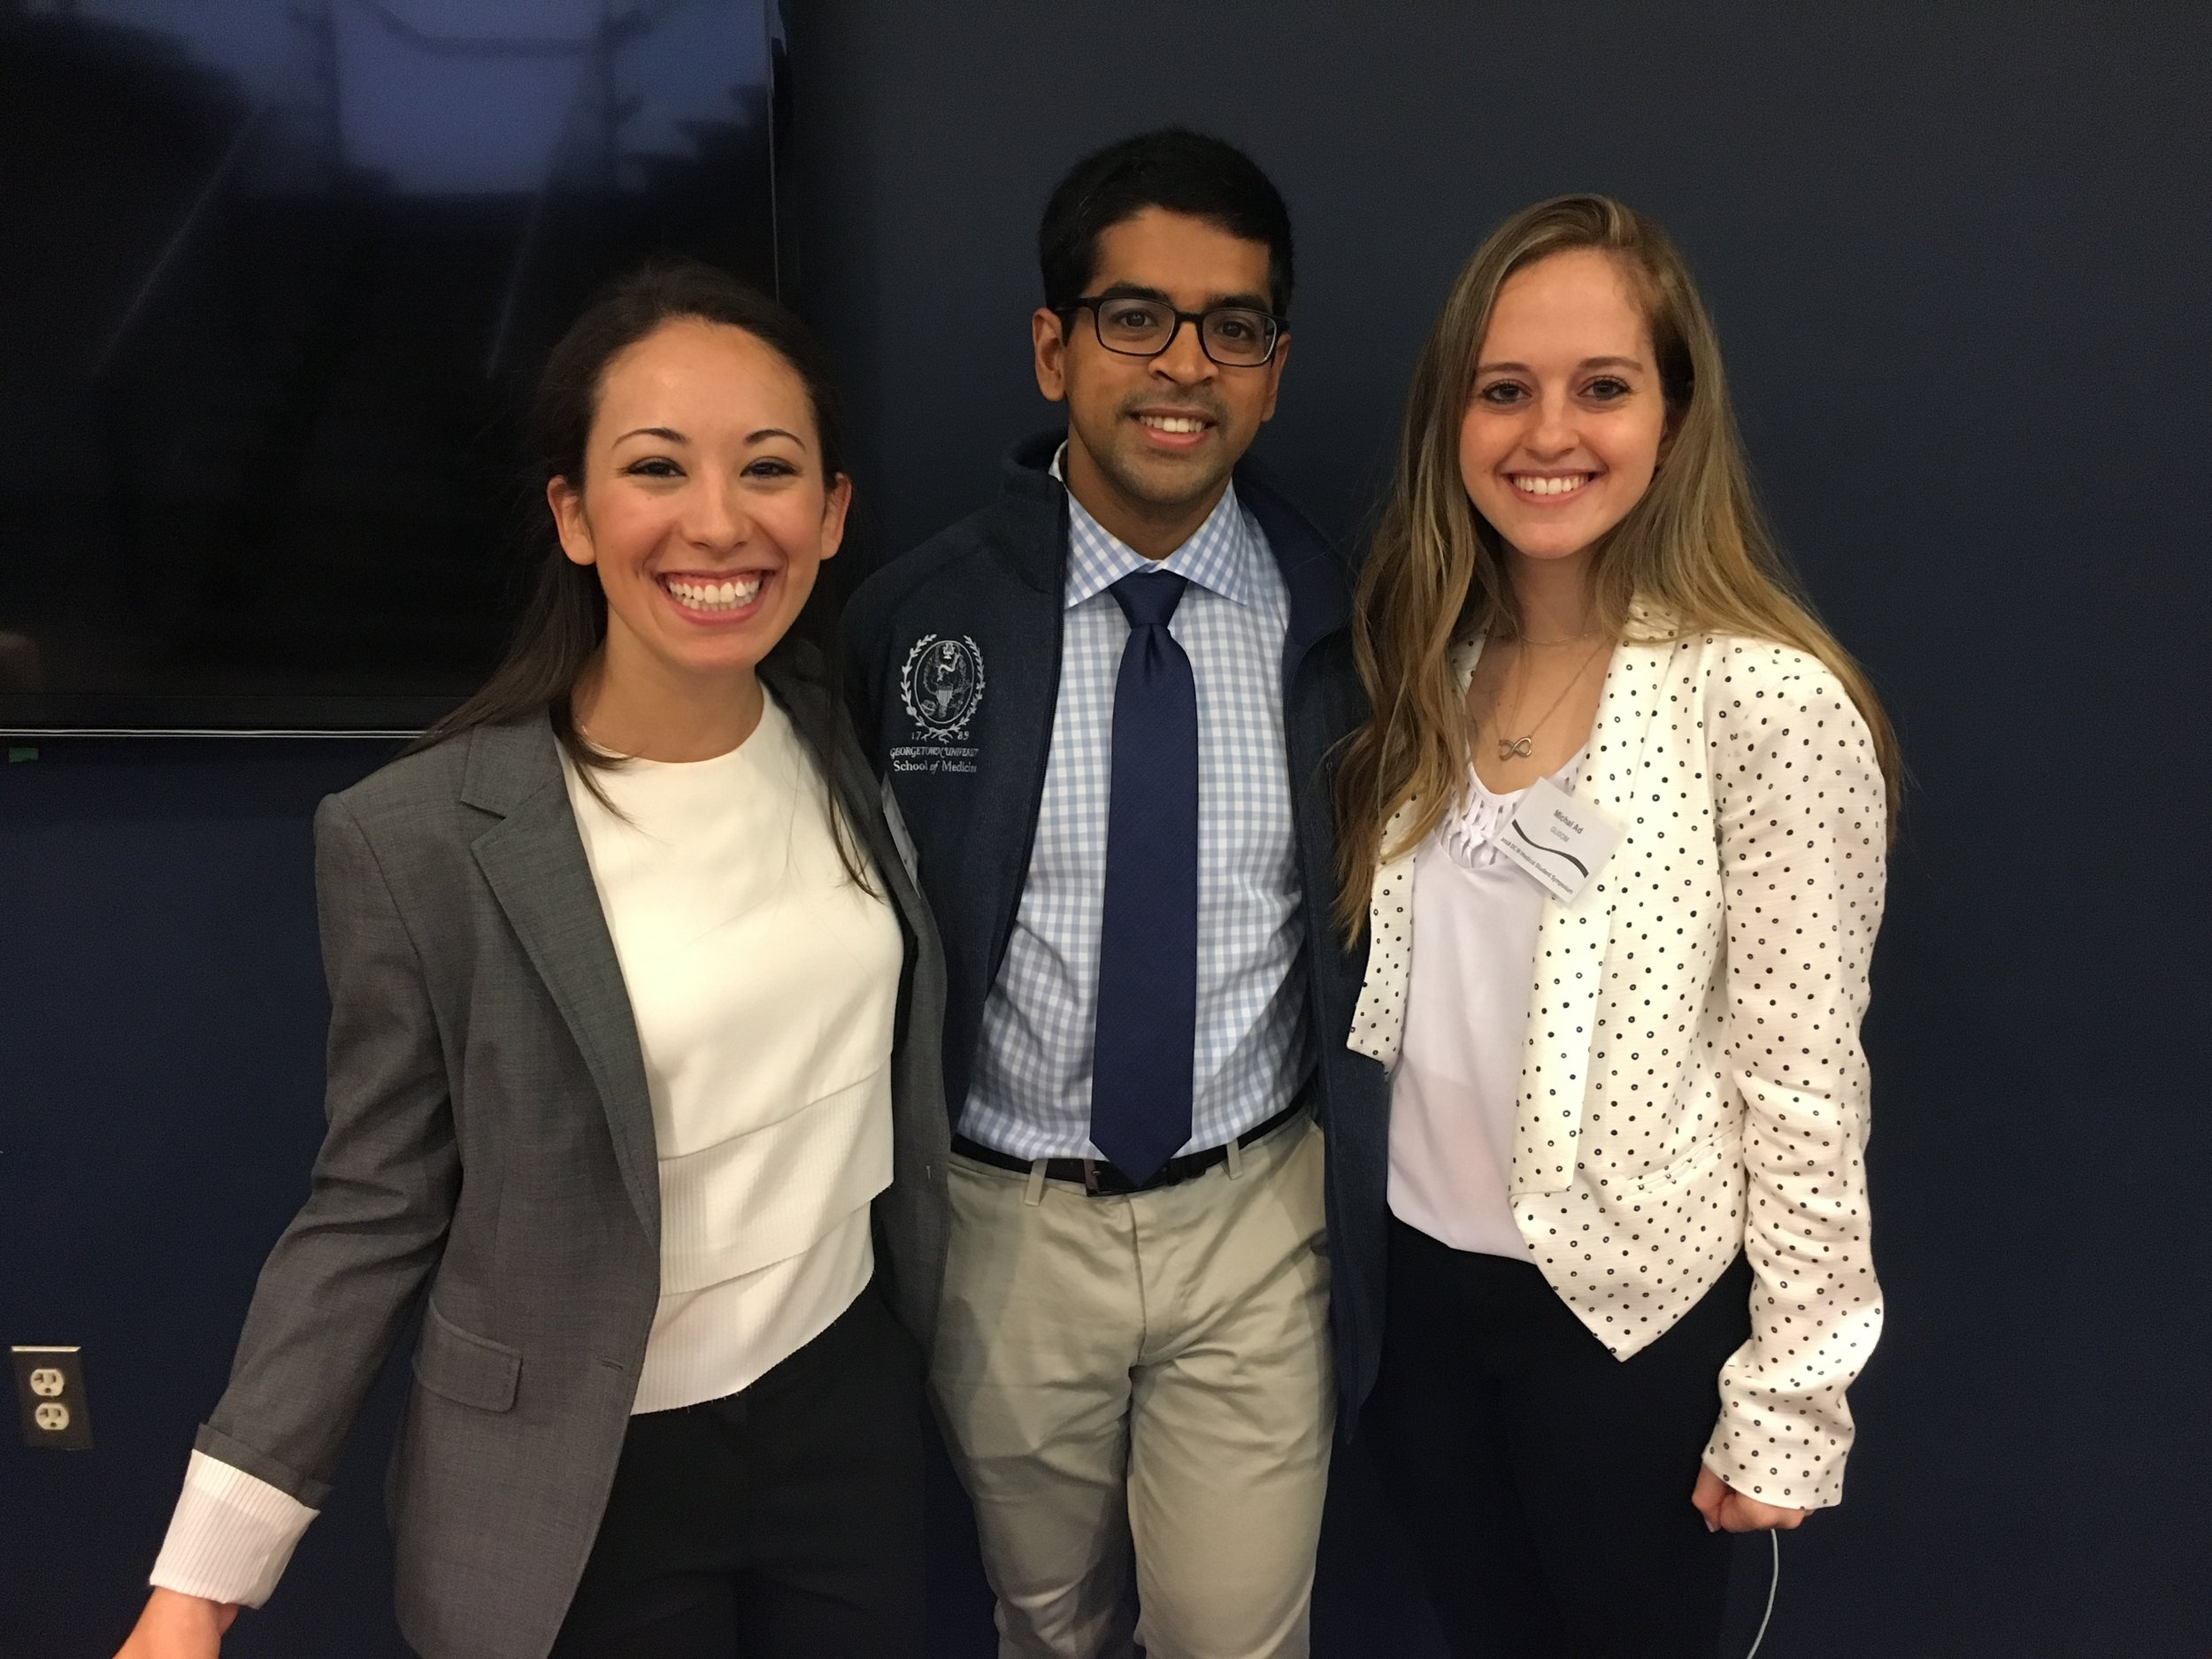 Symposium Planning Committee Members (left to right): Meredith Njus (Georgetown), Saumik Rahman (Georgetown), Michal Ad (Georgetown)